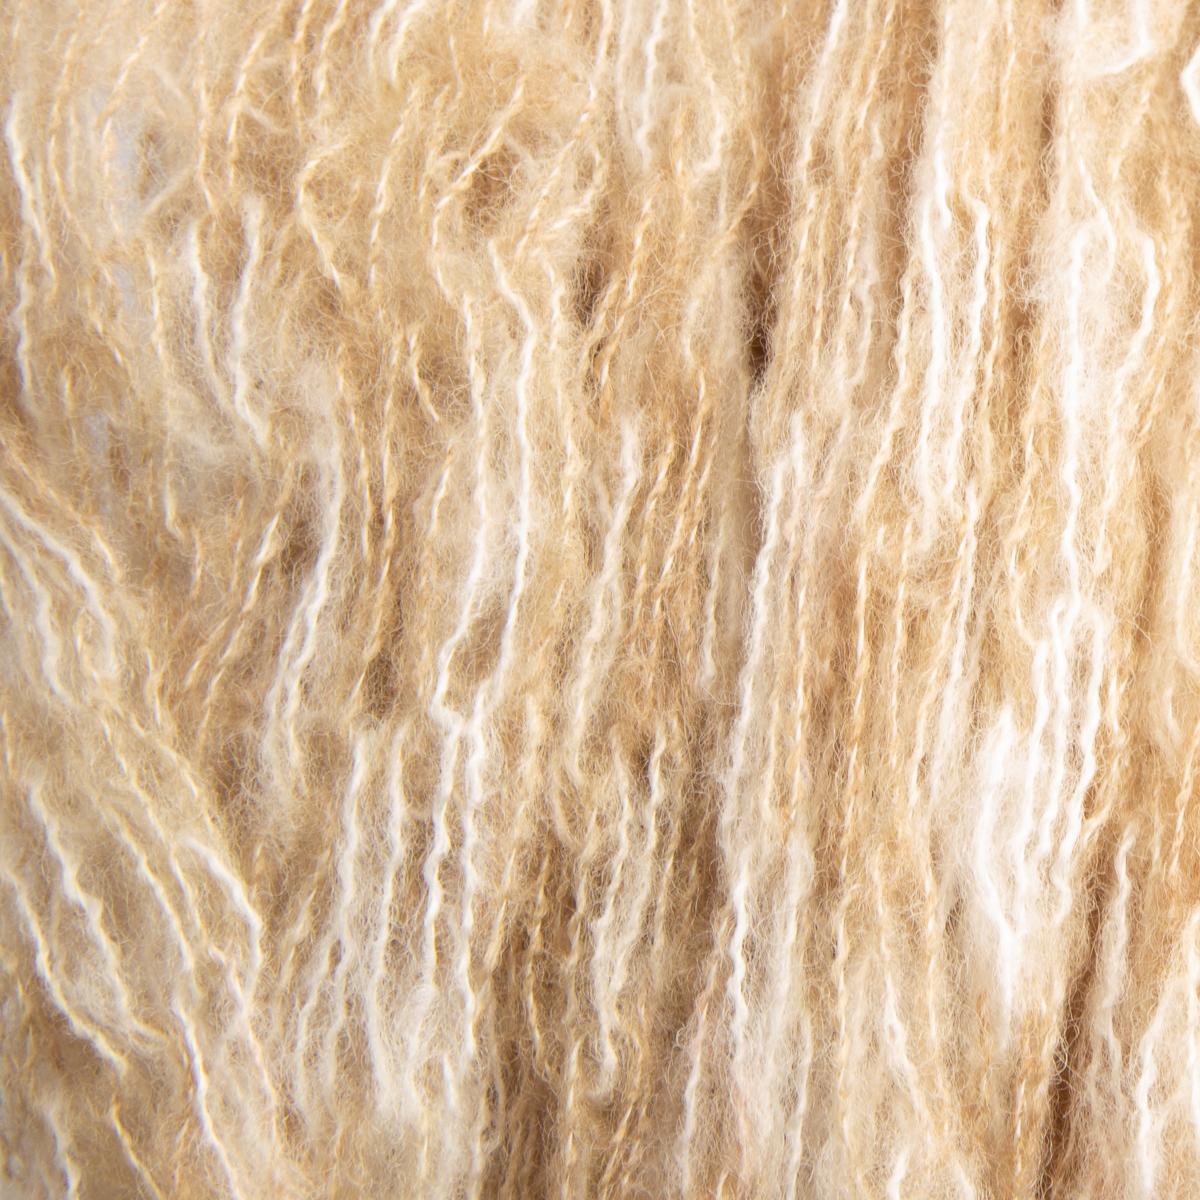 thumbnail 21 - 3pk-Lion-Brand-Imagine-Acrylic-Blend-Yarn-Super-Bulky-6-Knitting-Crochet-Soft